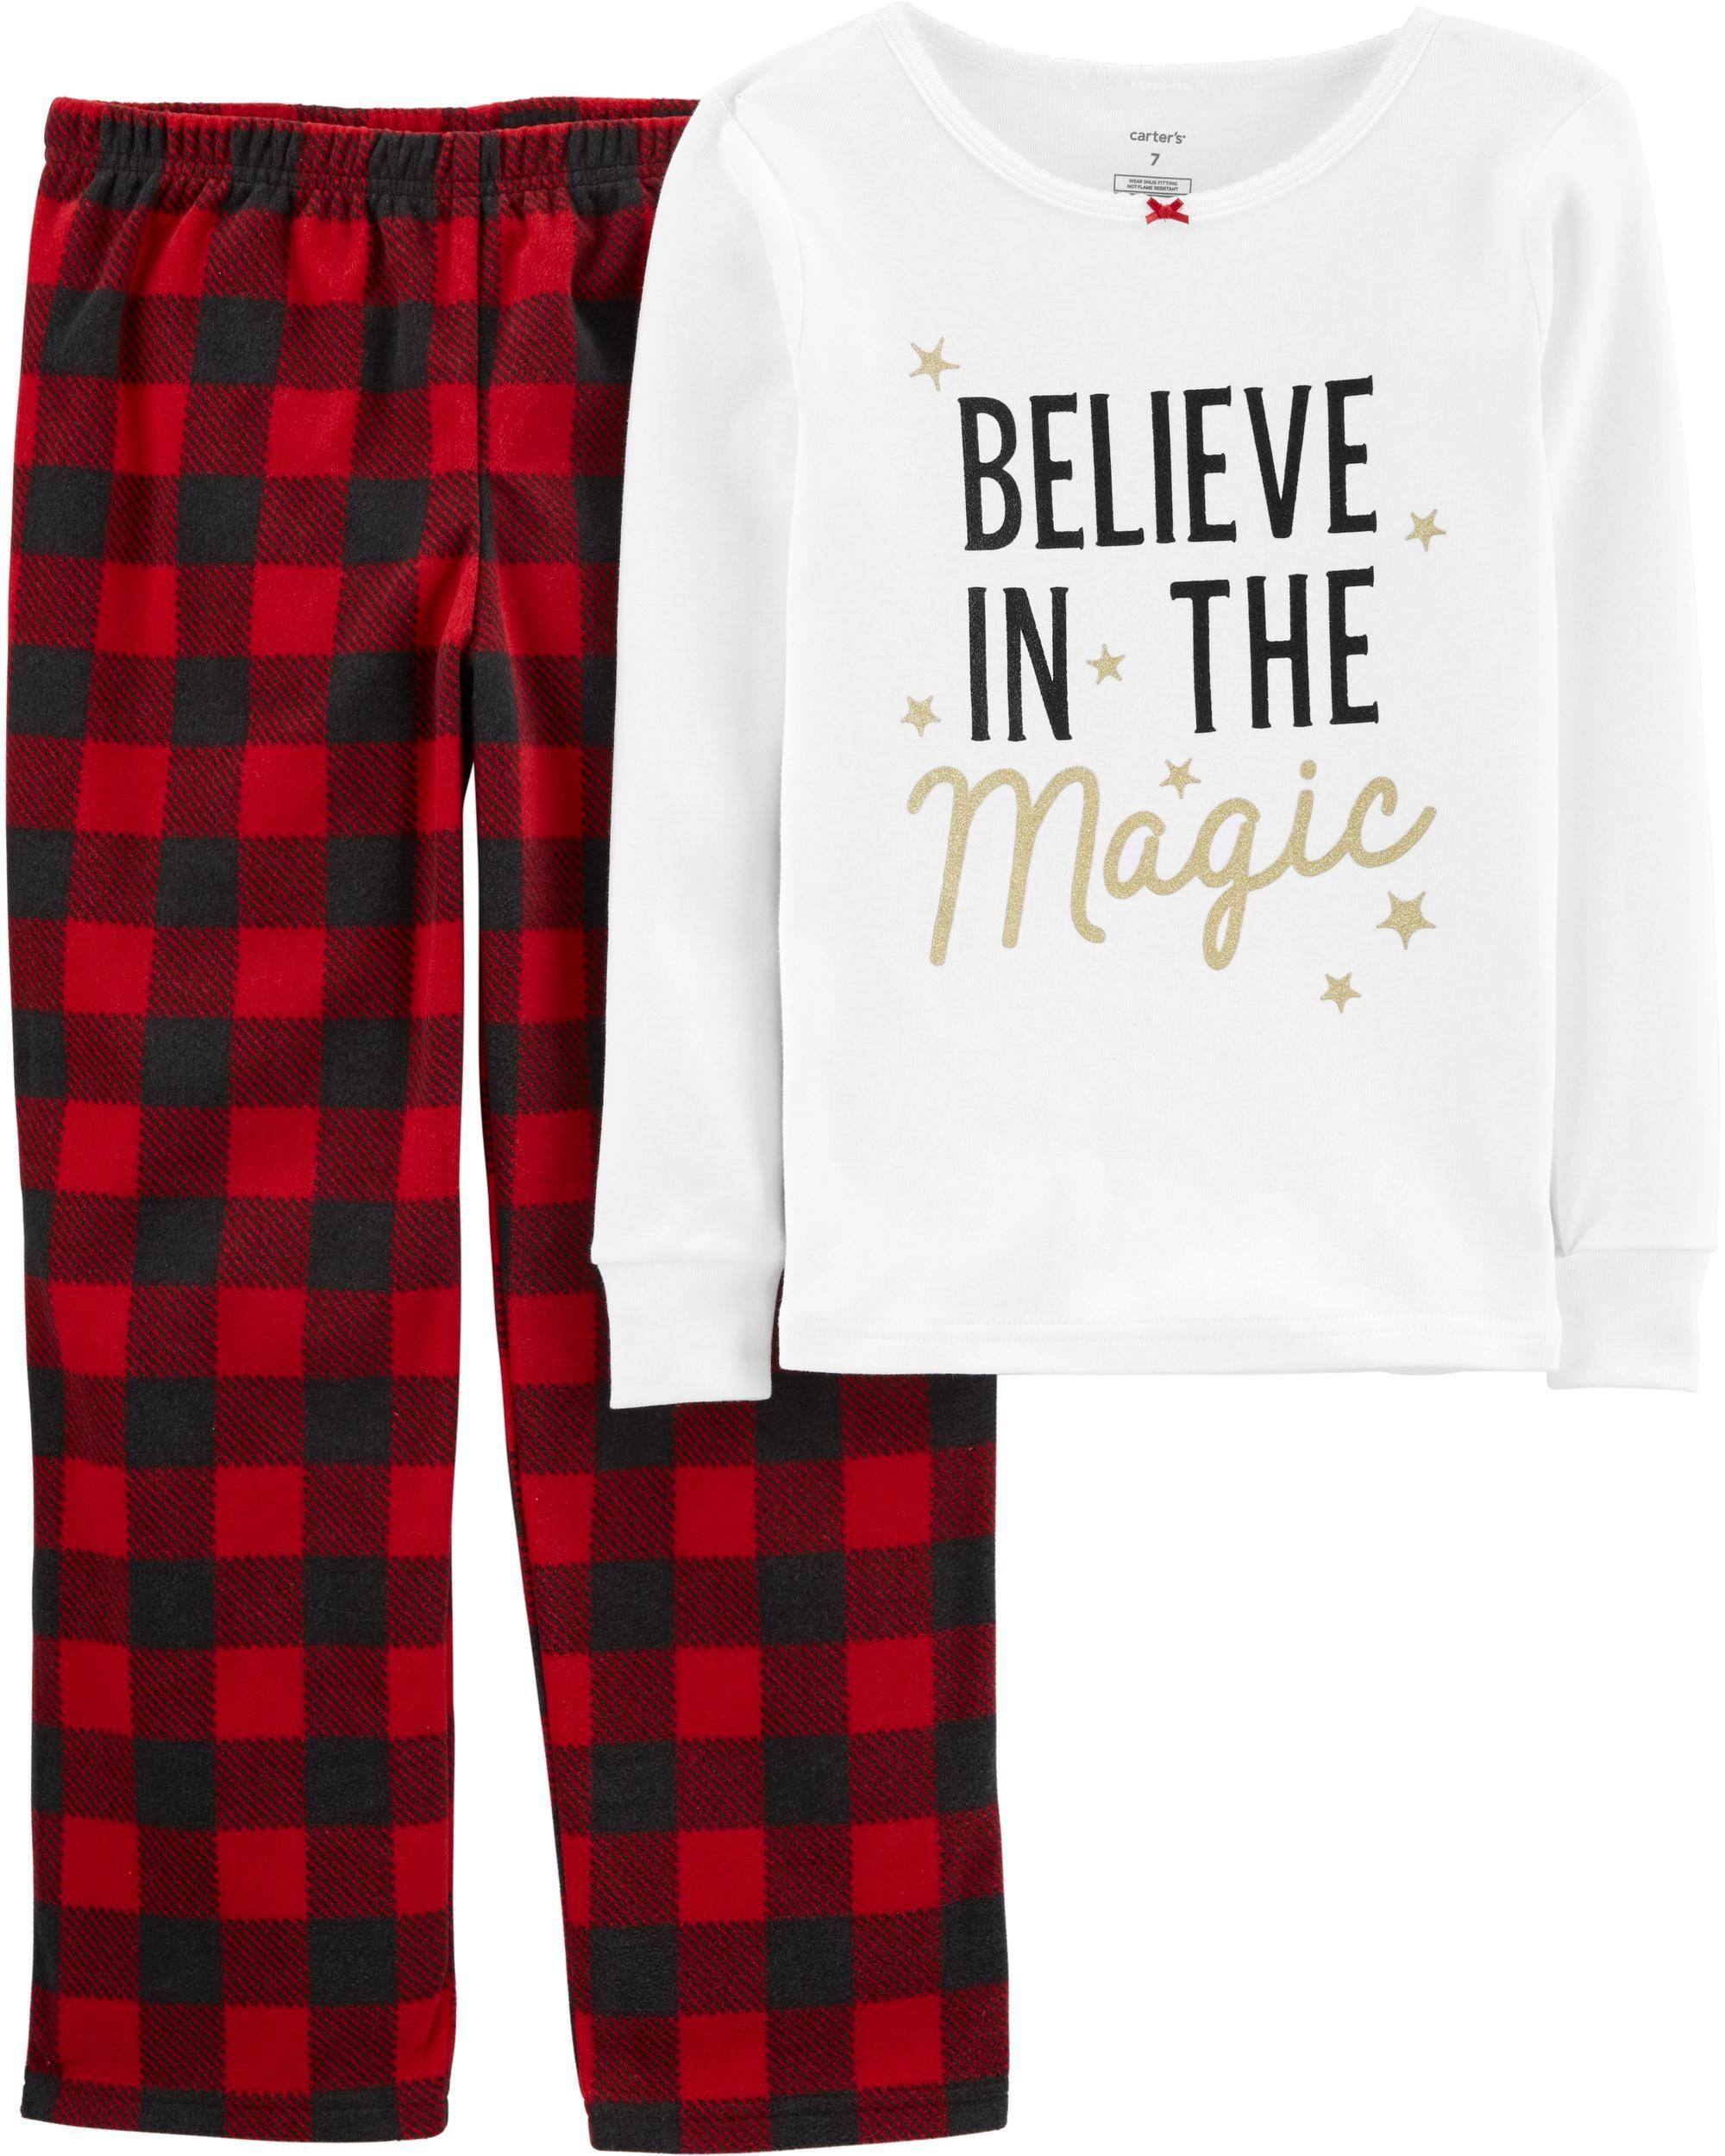 2 Piece Christmas Magic Snug Fit Cotton Fleece Pjs Fleece Pjs Pajama Set Kids Pajamas